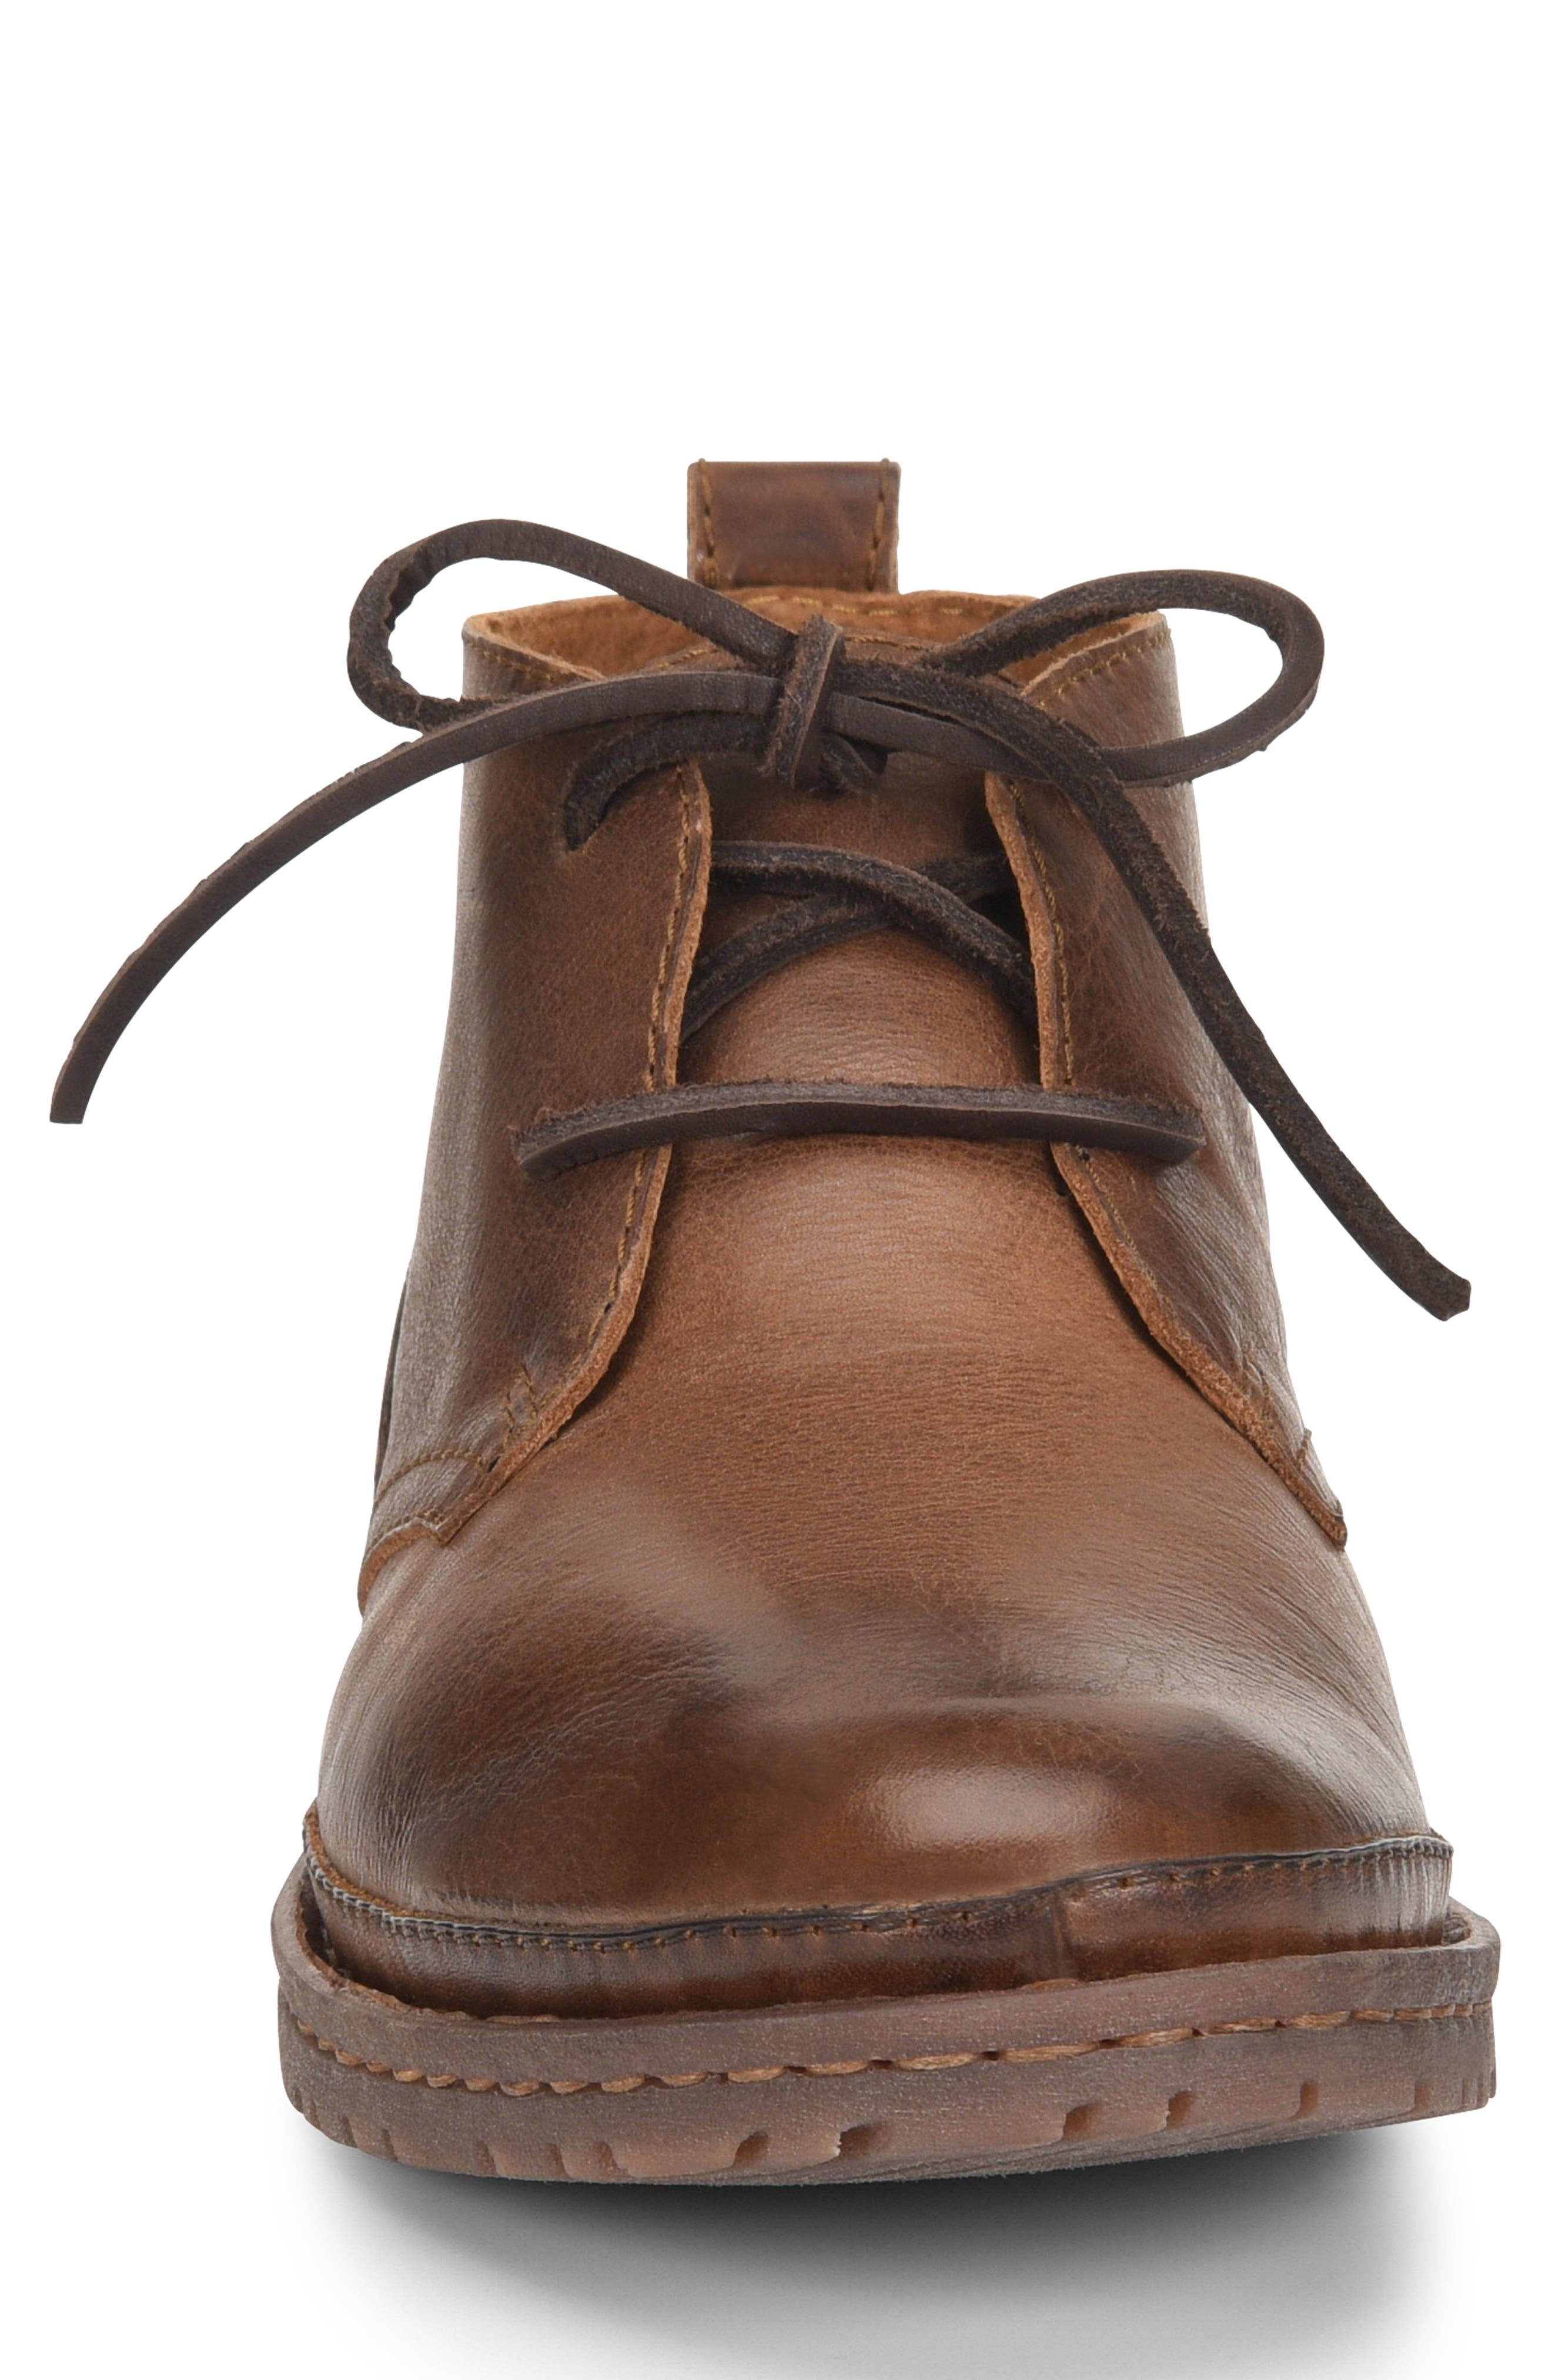 Elk II Chukka Boot,                             Alternate thumbnail 4, color,                             BROWN/BROWN LEATHER